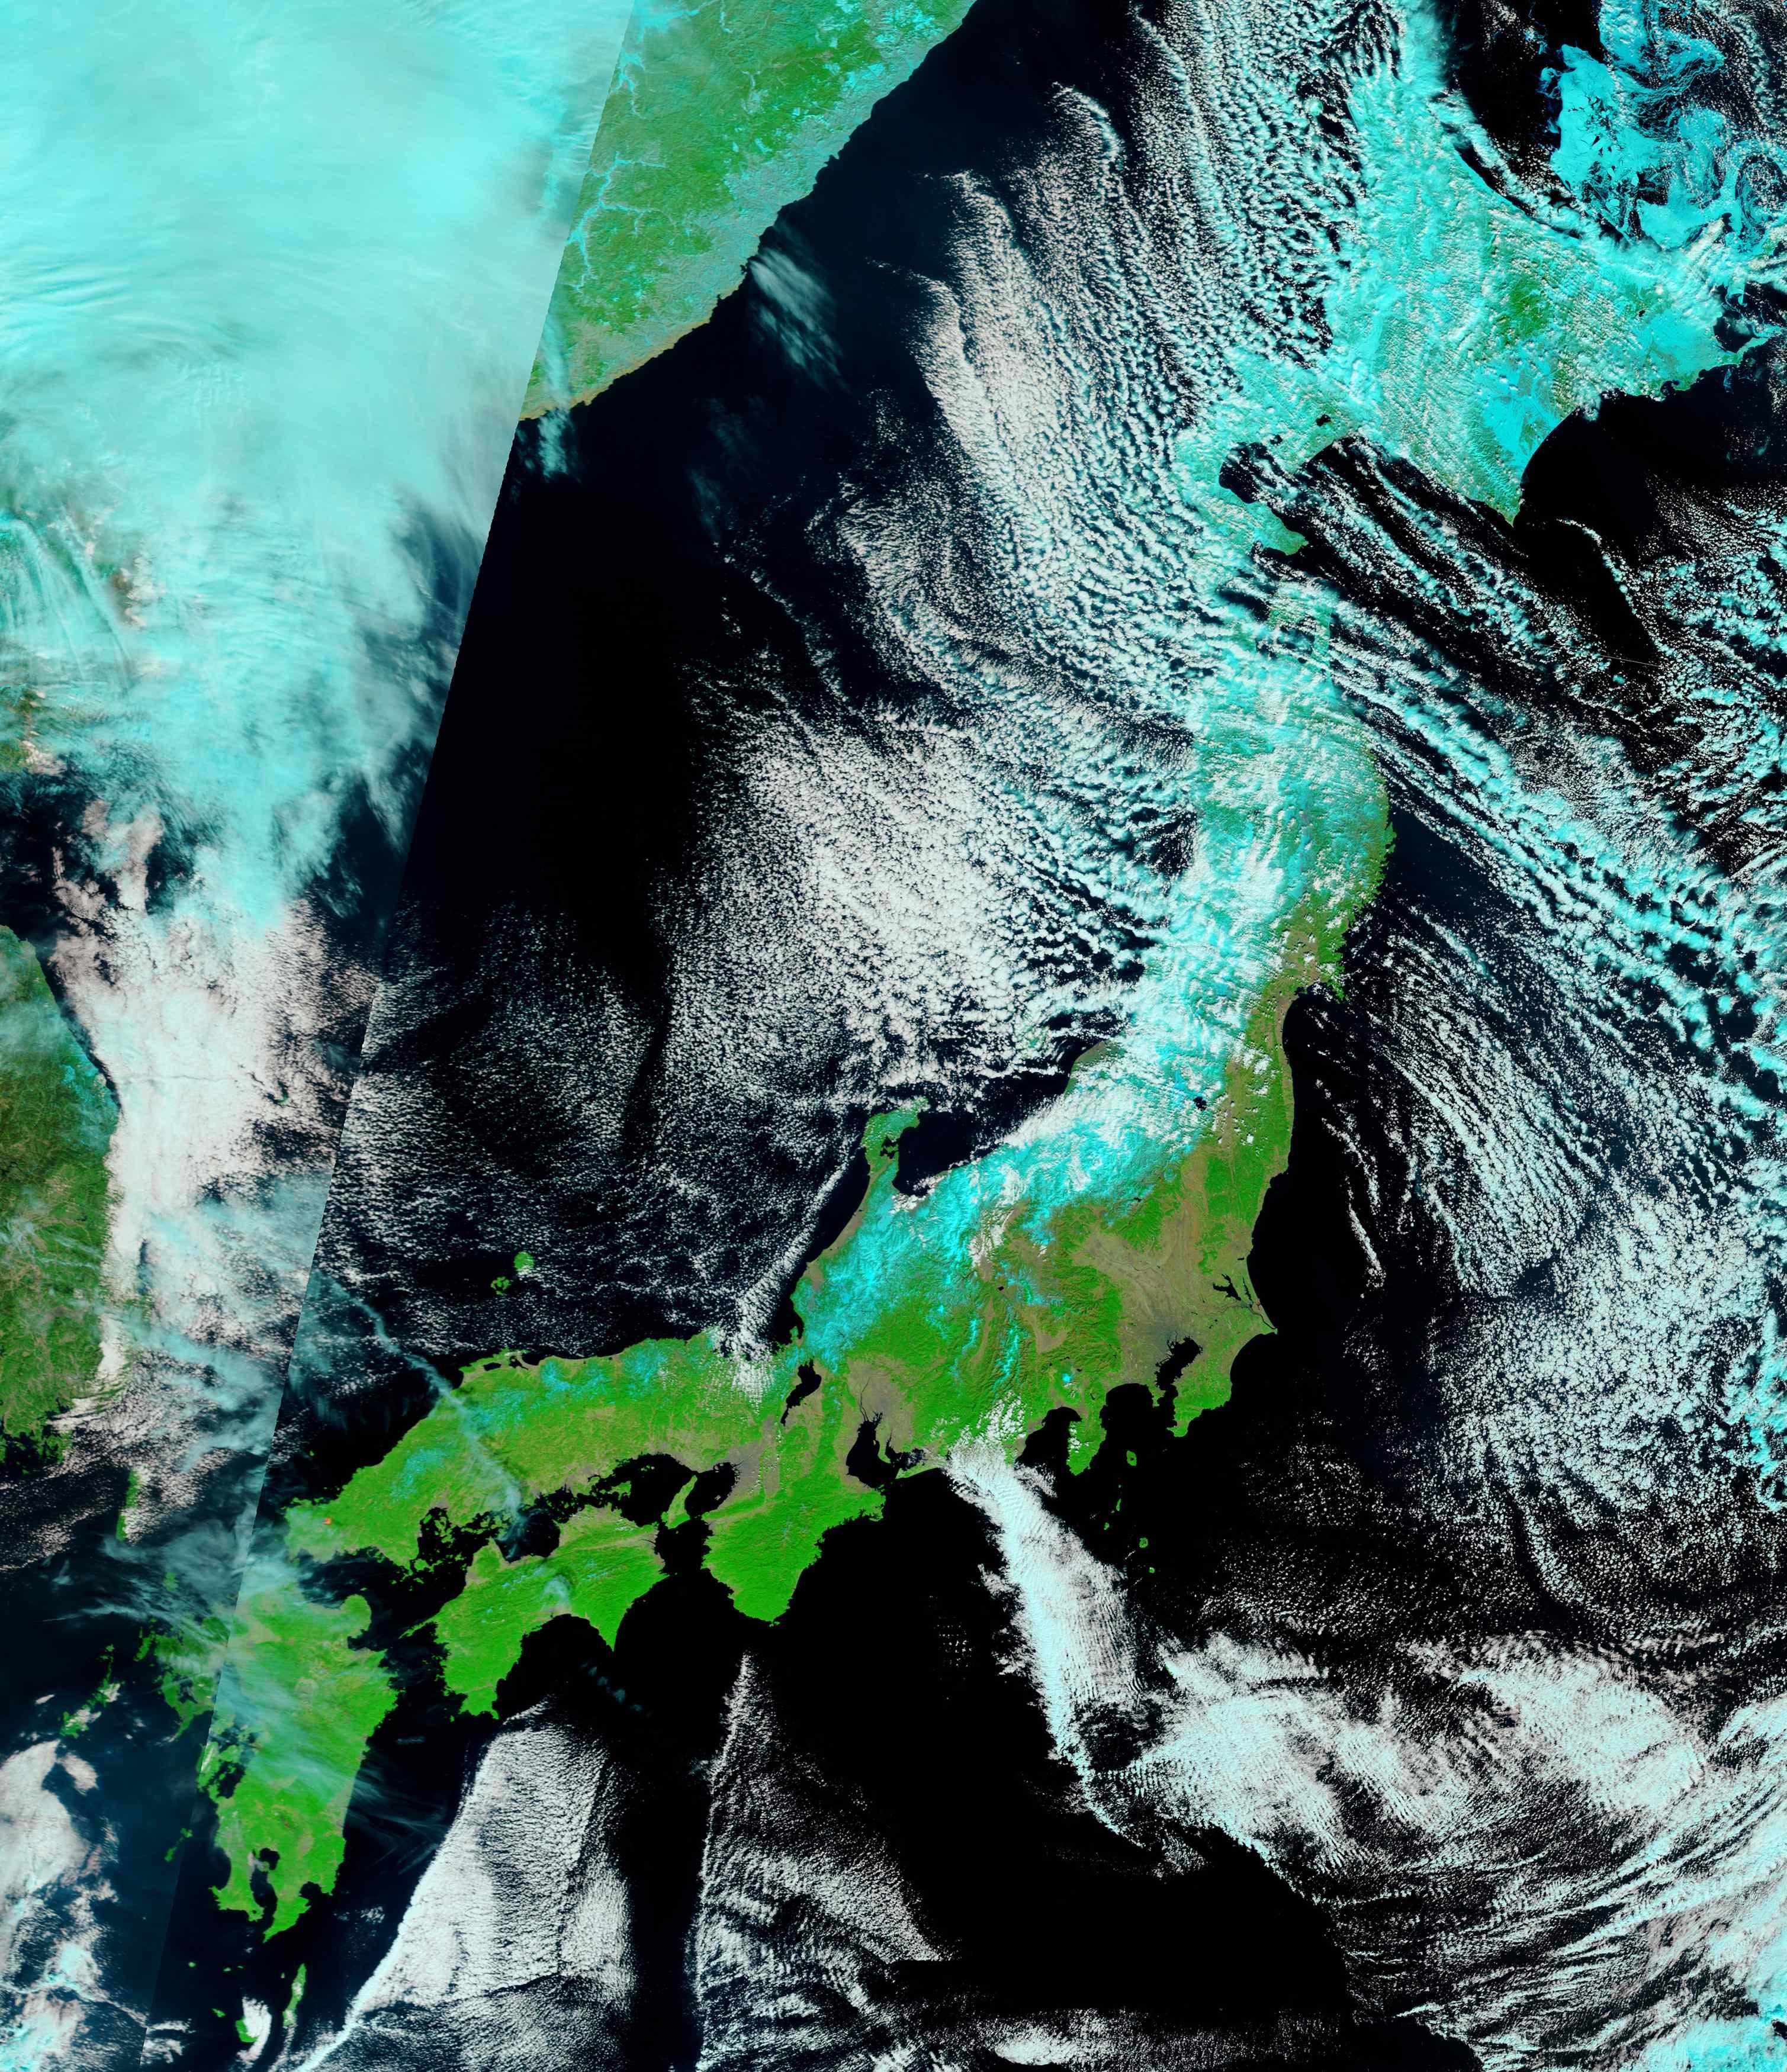 H περιοχή Σεντάι απο το διάστημα όπως φαινόταν στις 26 Φεβουαρίου. ΦΩΤΟ REUTERS